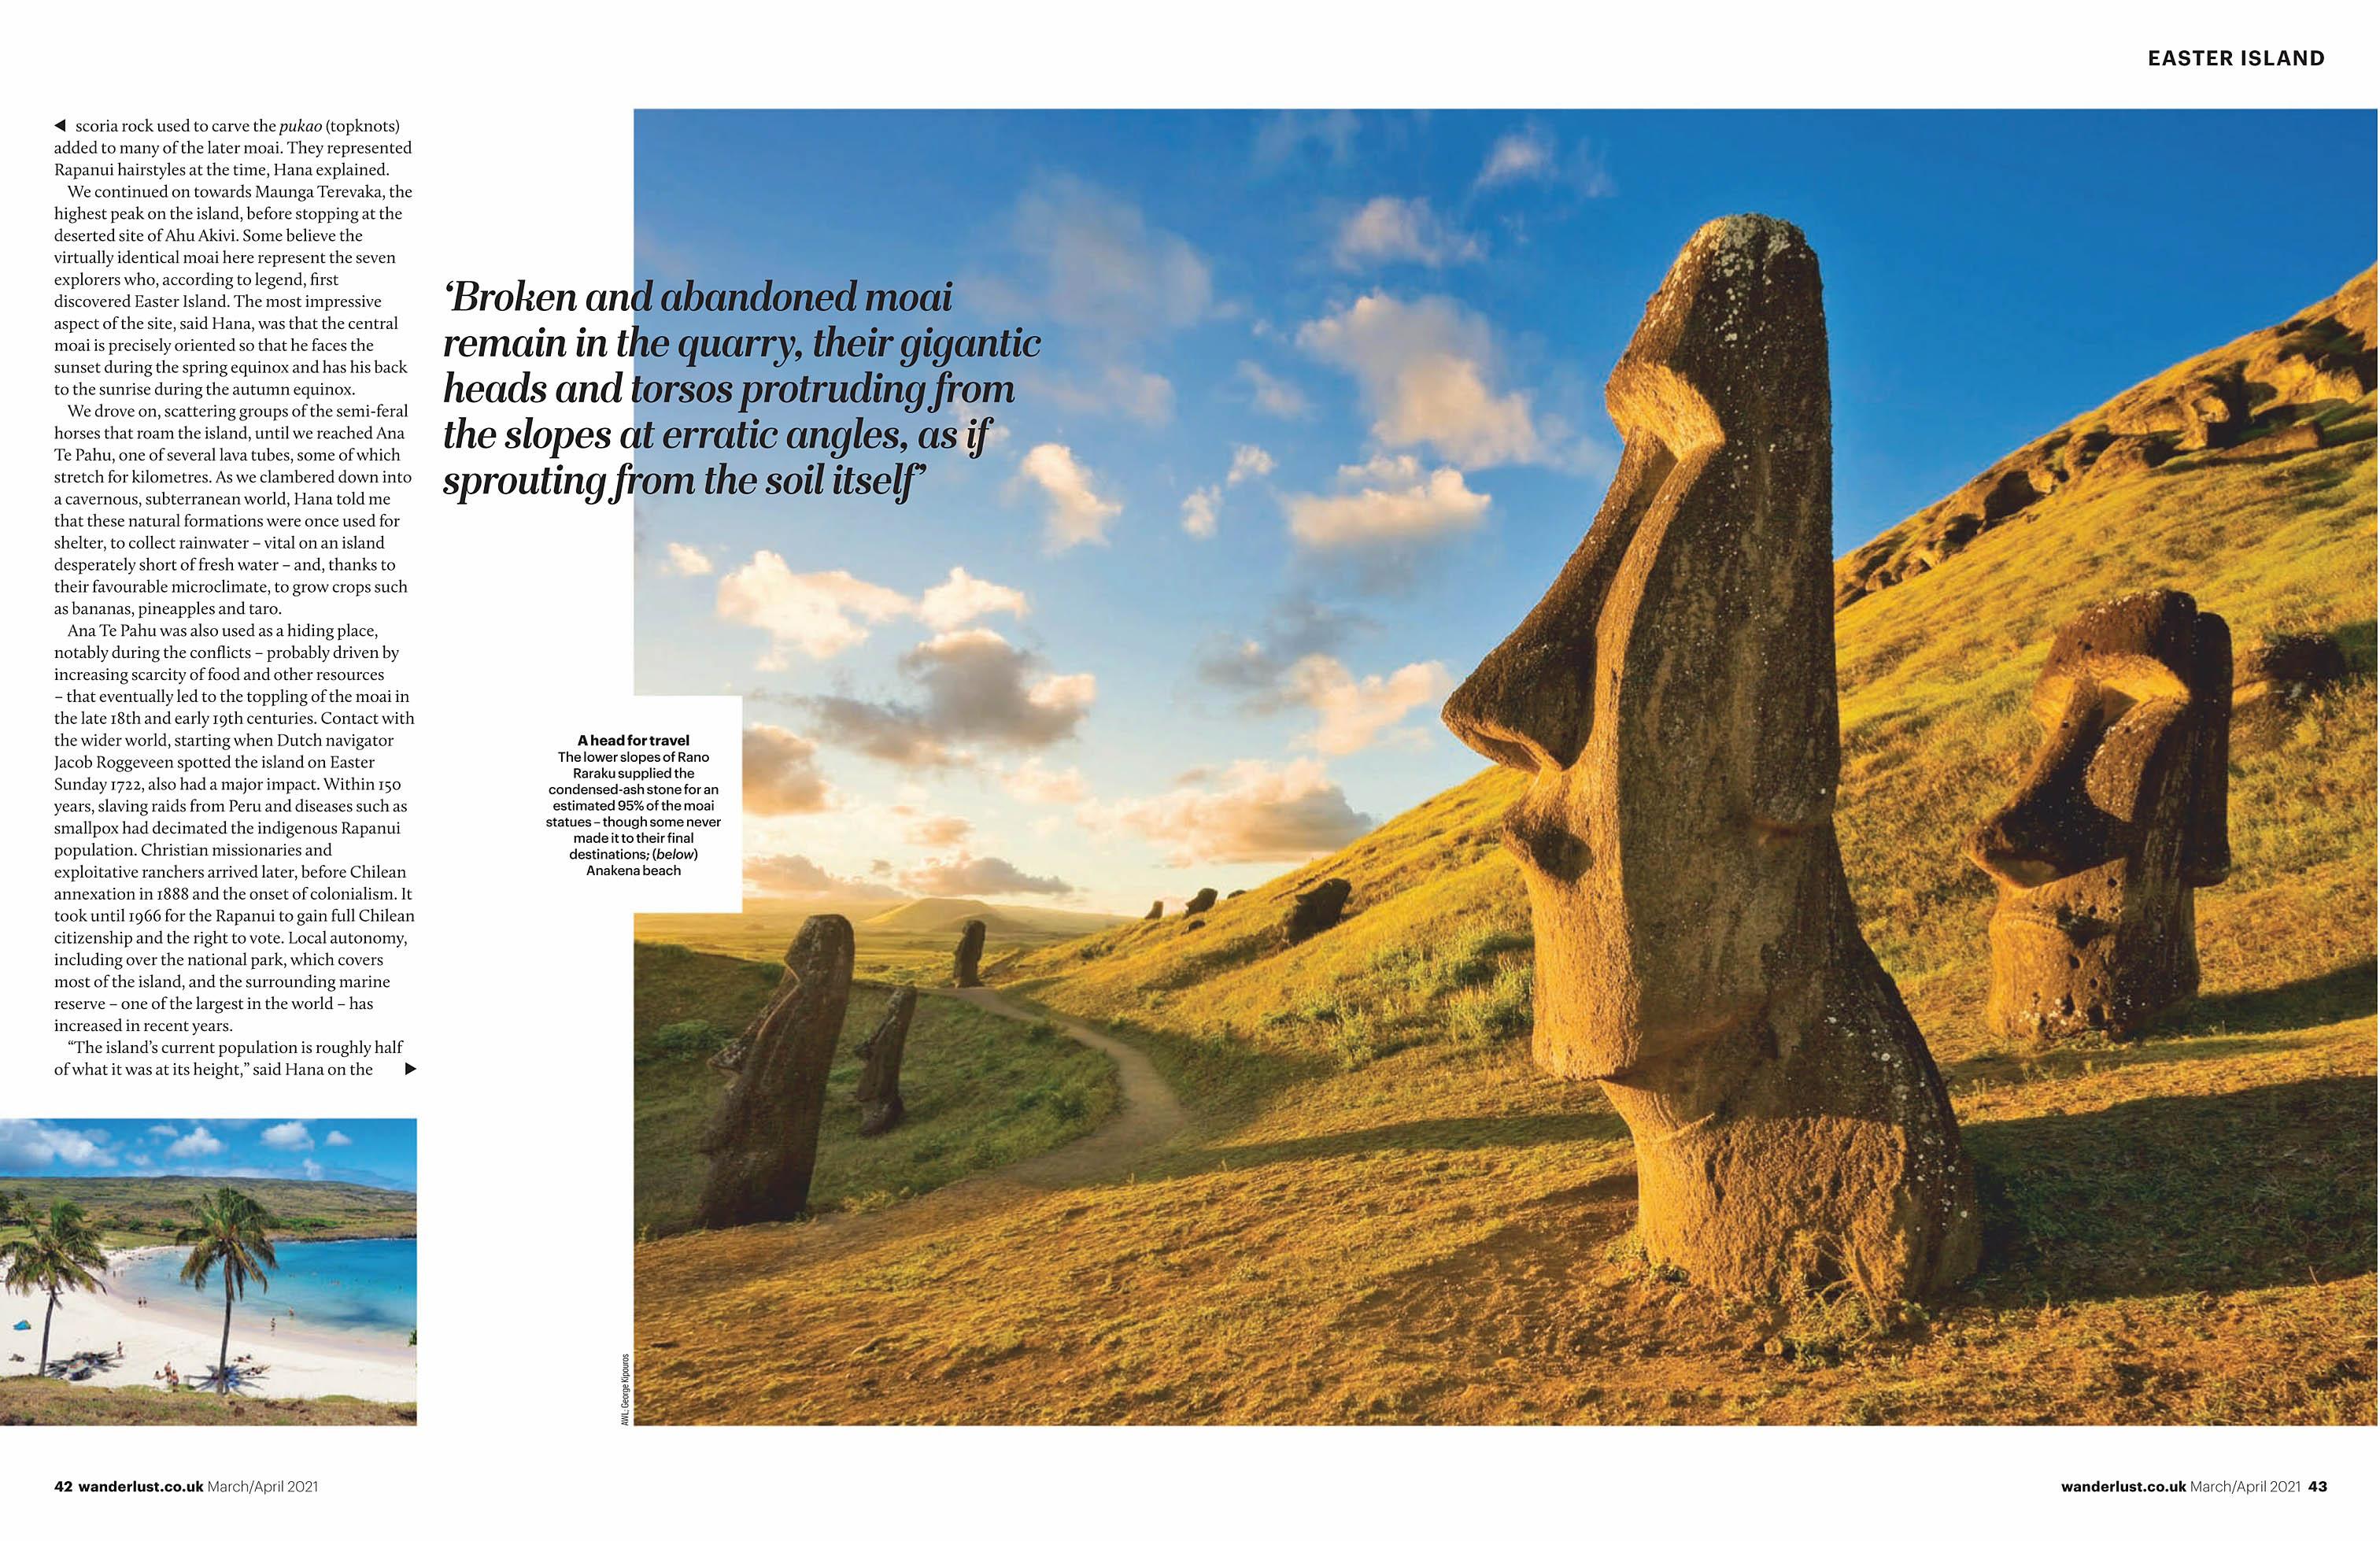 Wanderlust 2021-03-04 Easter Island-5.jpg